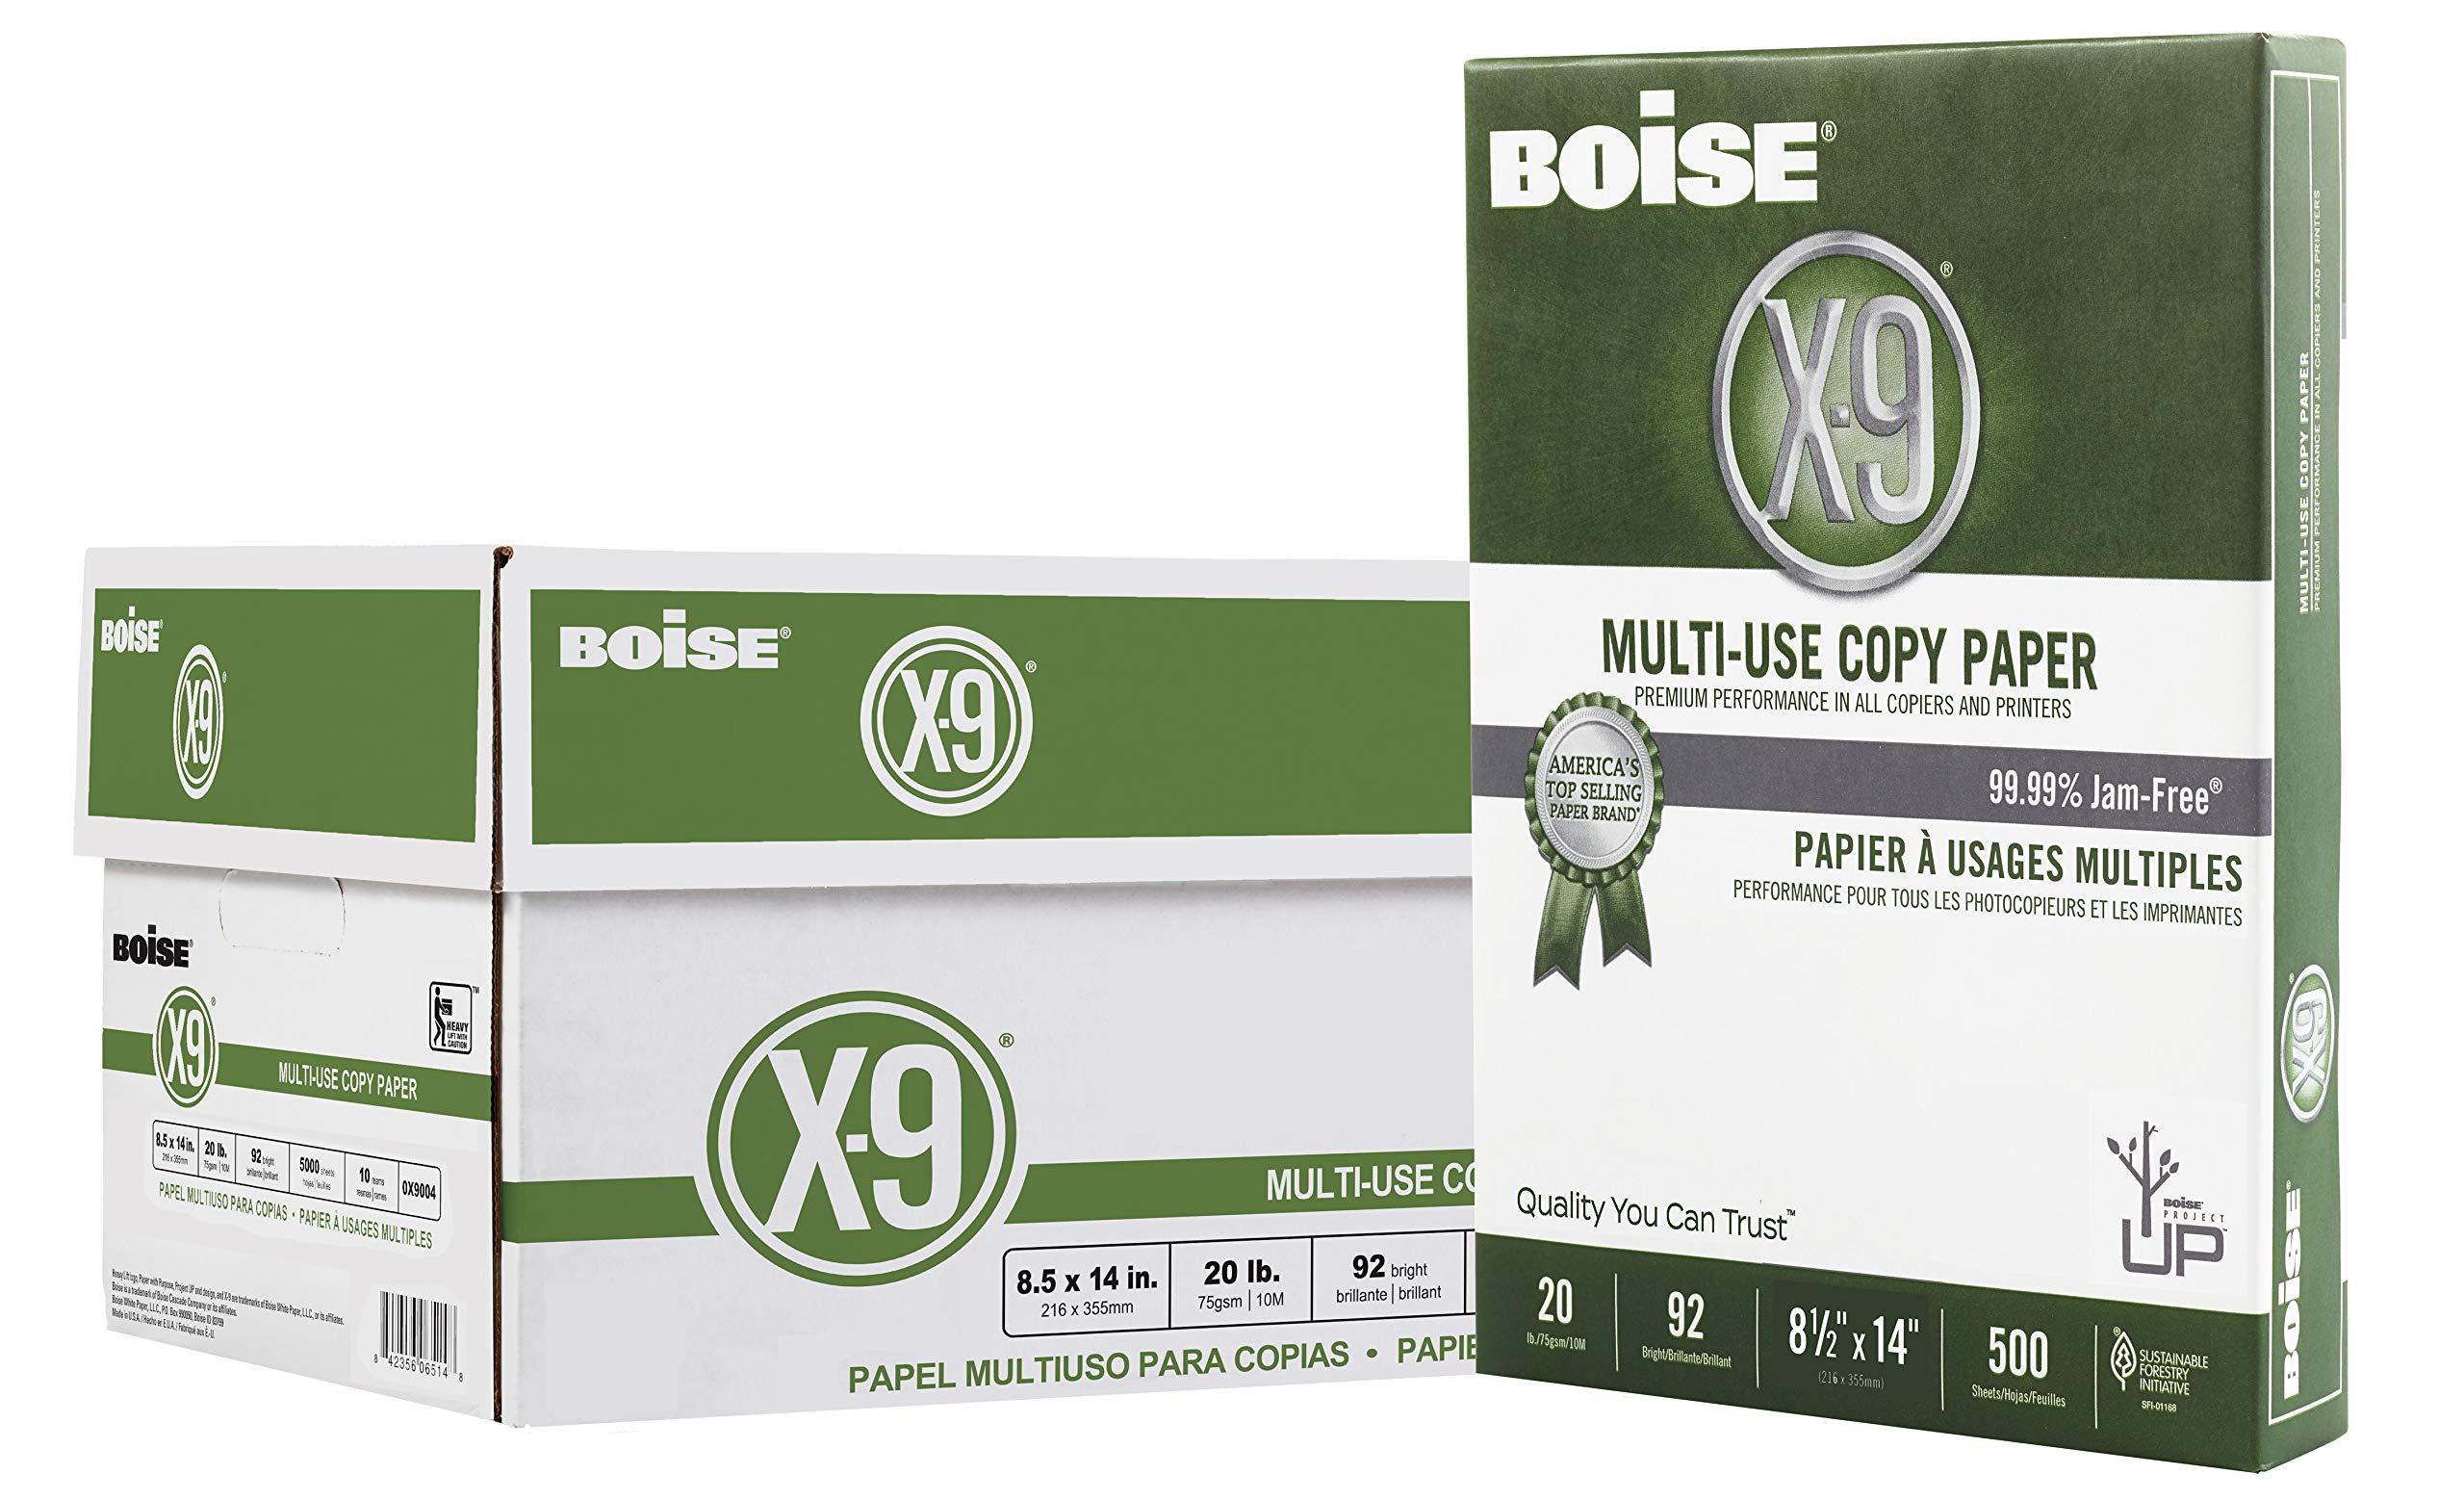 Boise X-9 Multi-Use Copy Paper, 8.5'' x 14'', 92 Bright, 20 lb, 10 Ream Carton (5,000 Sheets) by Boise Paper